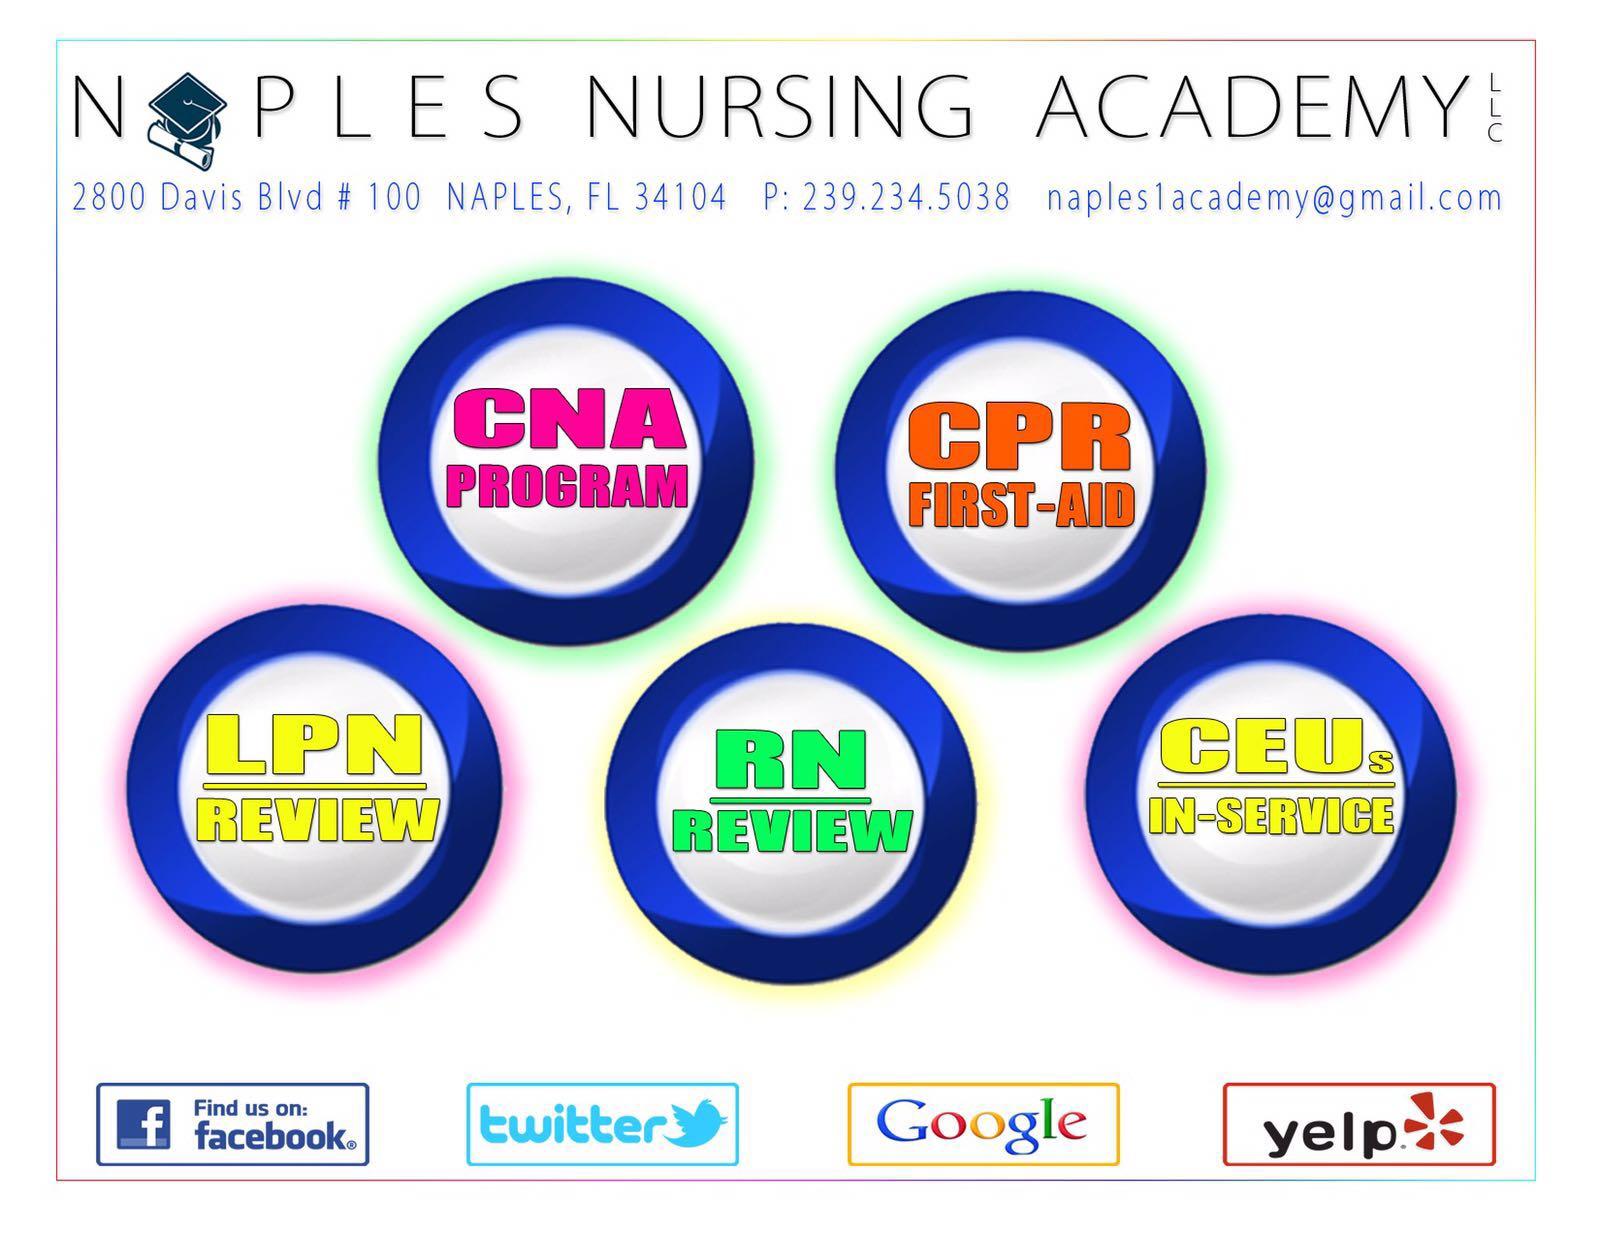 Naples Nursing